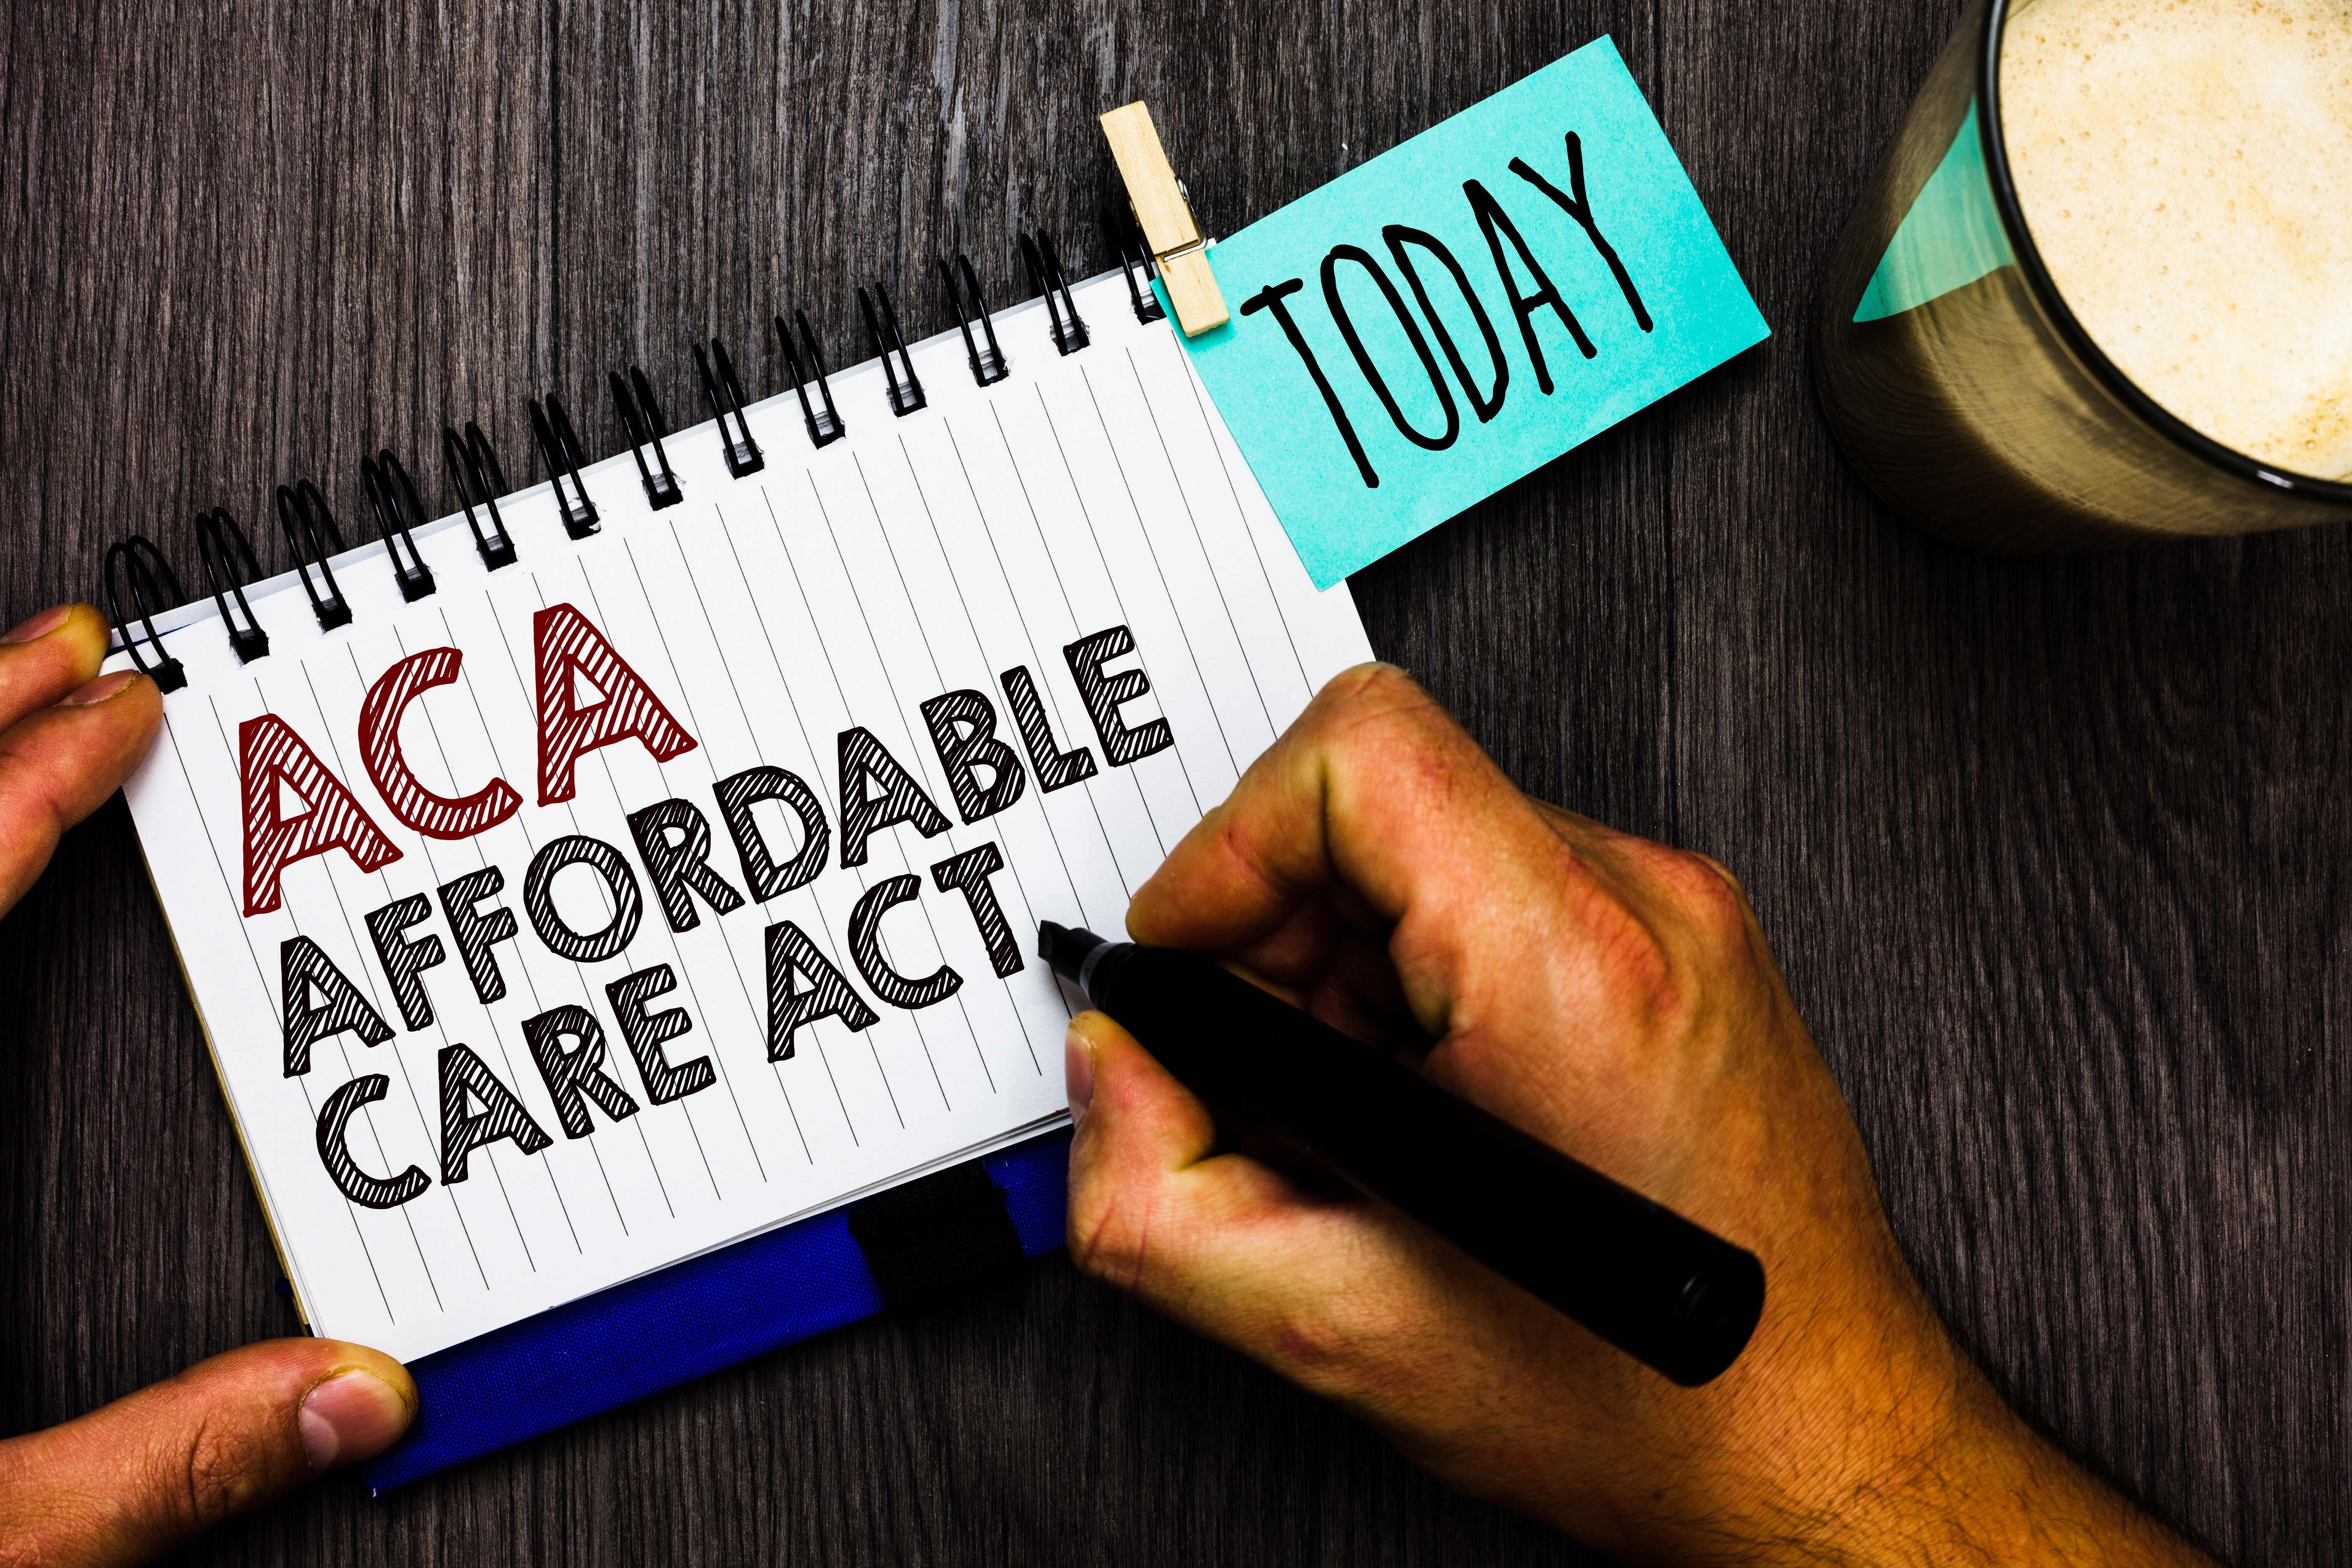 ACA employer mandate still in place despite court ruling